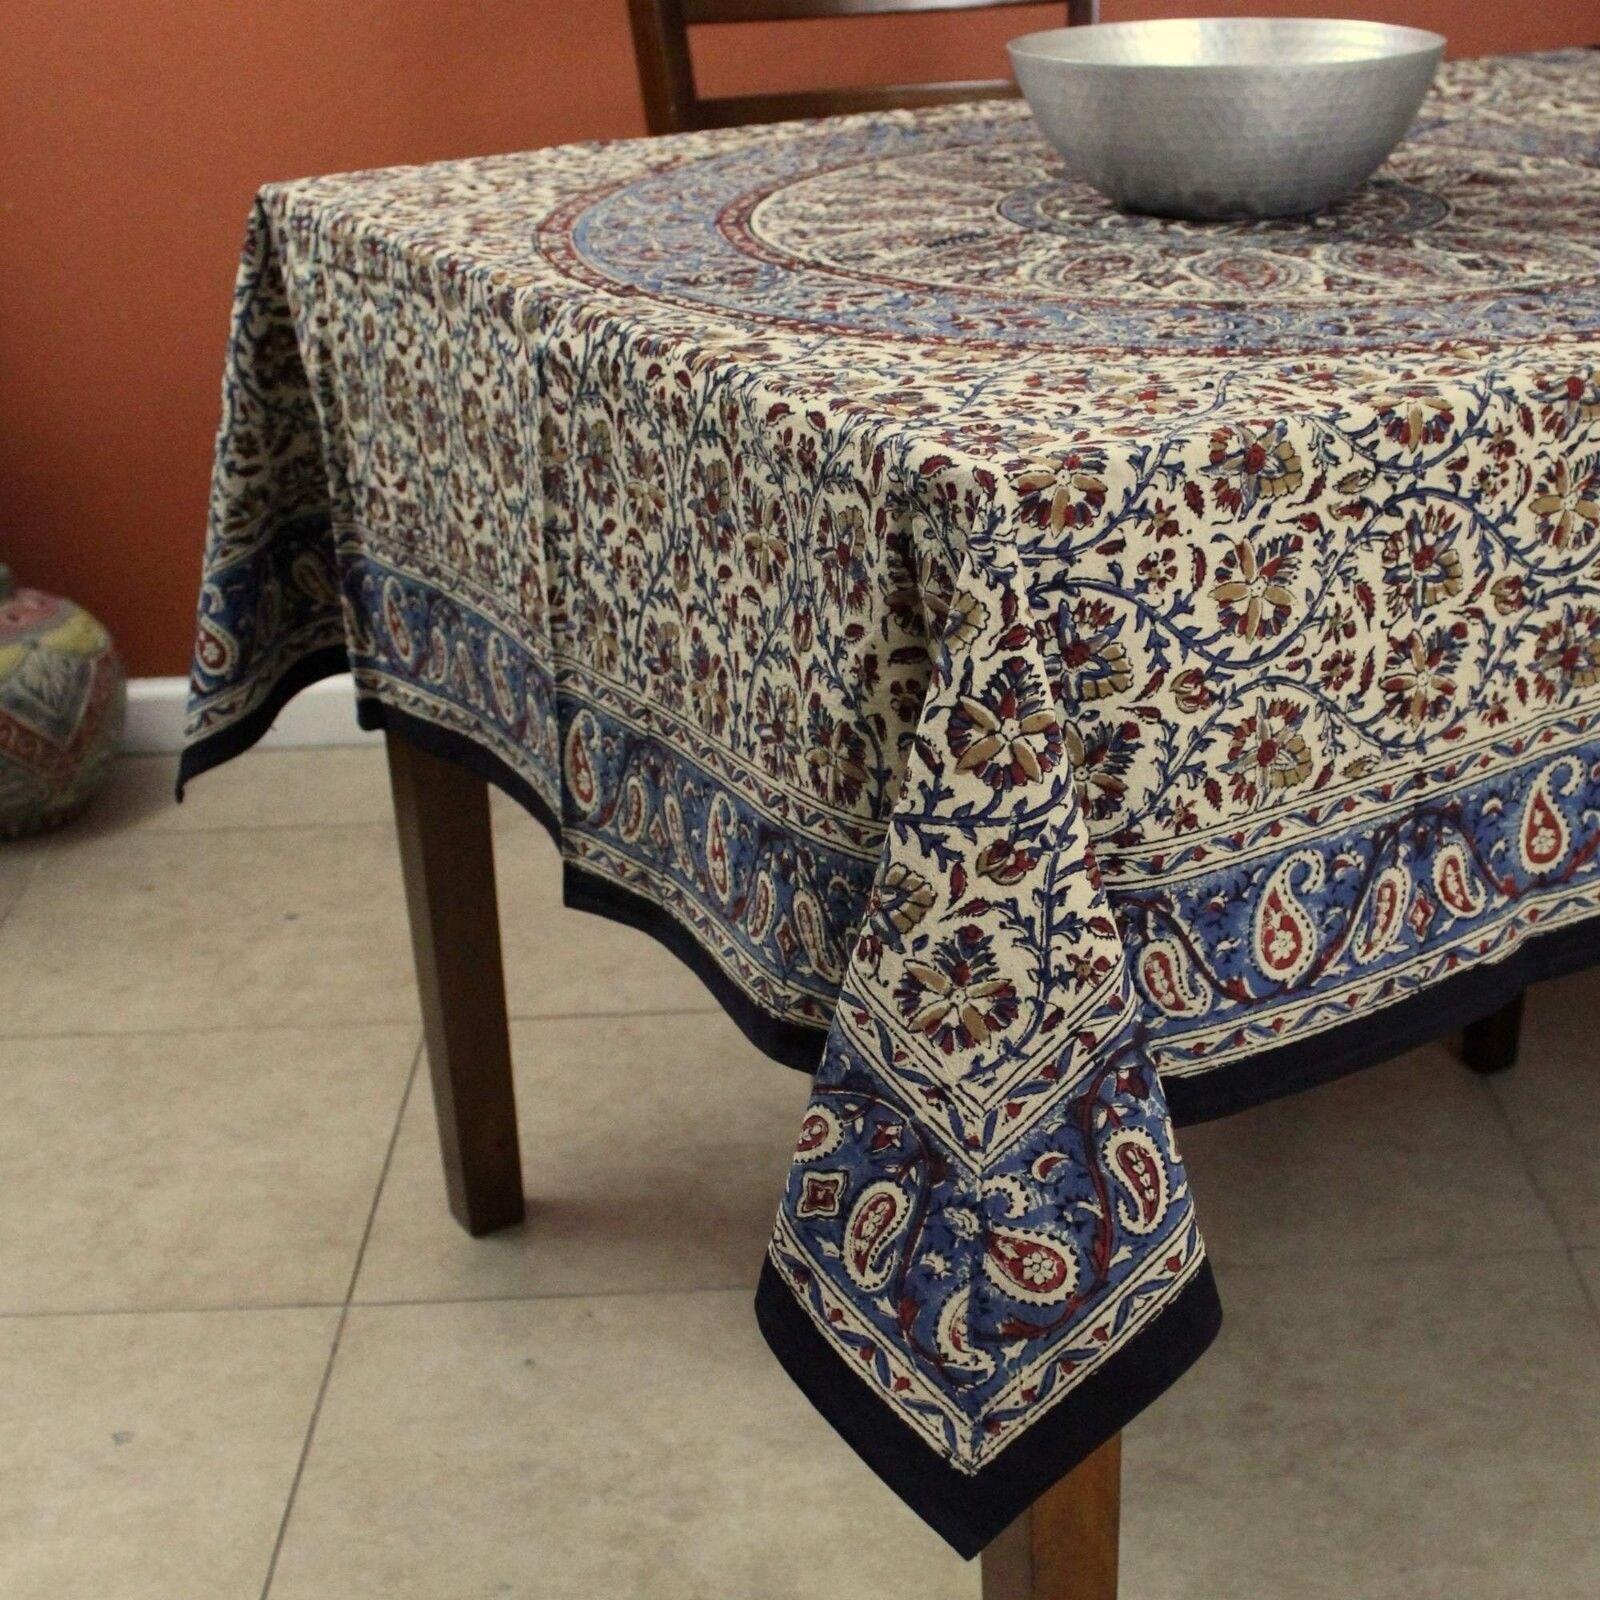 ... Kalamkari Mandala Floral Paisley Block Print Cotton Tablecloth  Rectangular 60x90 Inch Square 60x60 Round Napkins Placemats ...